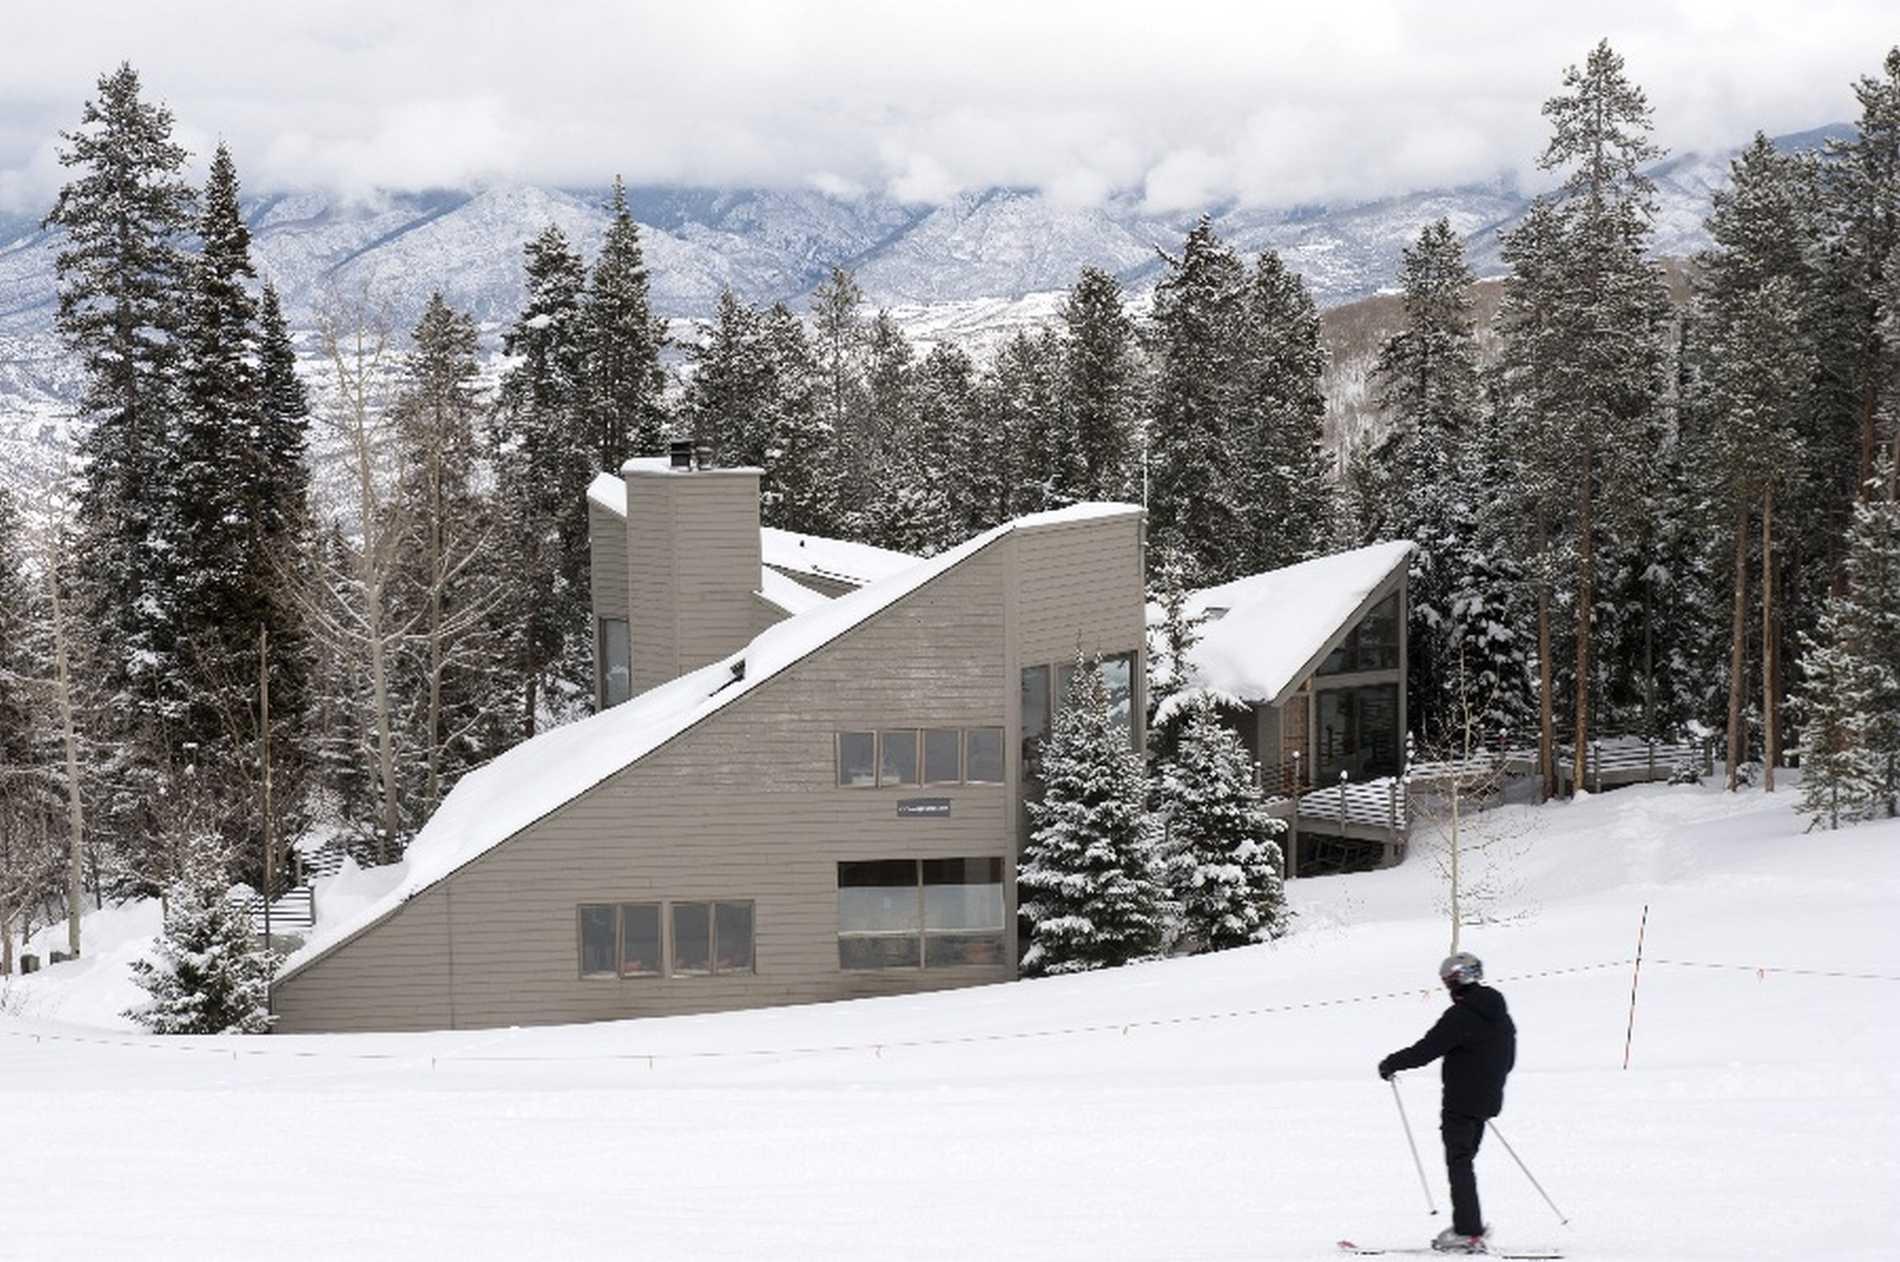 85 Pine Lane Snowmass Village Photo 43